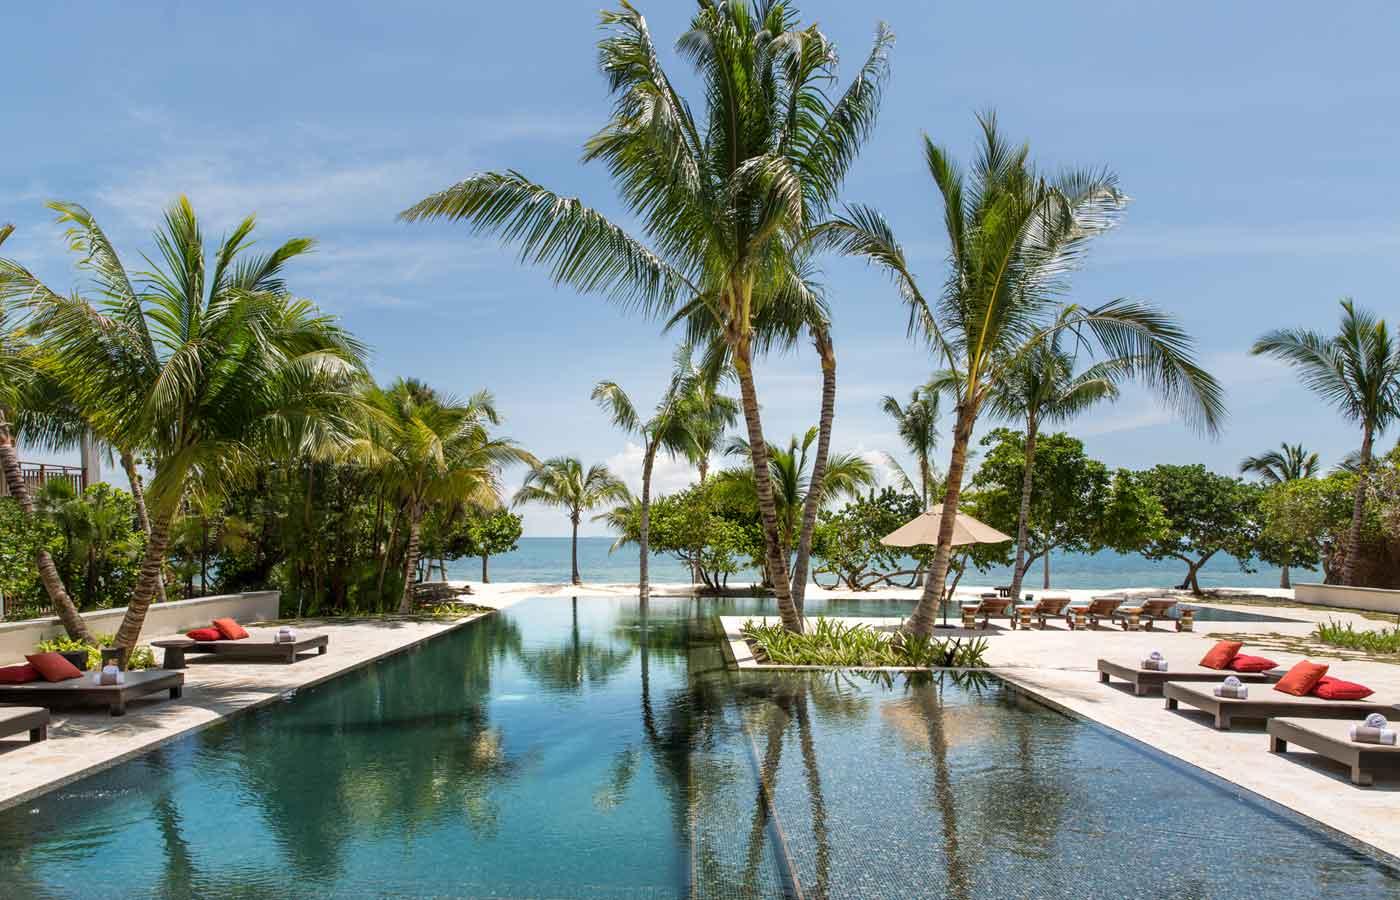 Itz'ana Resort, Belize